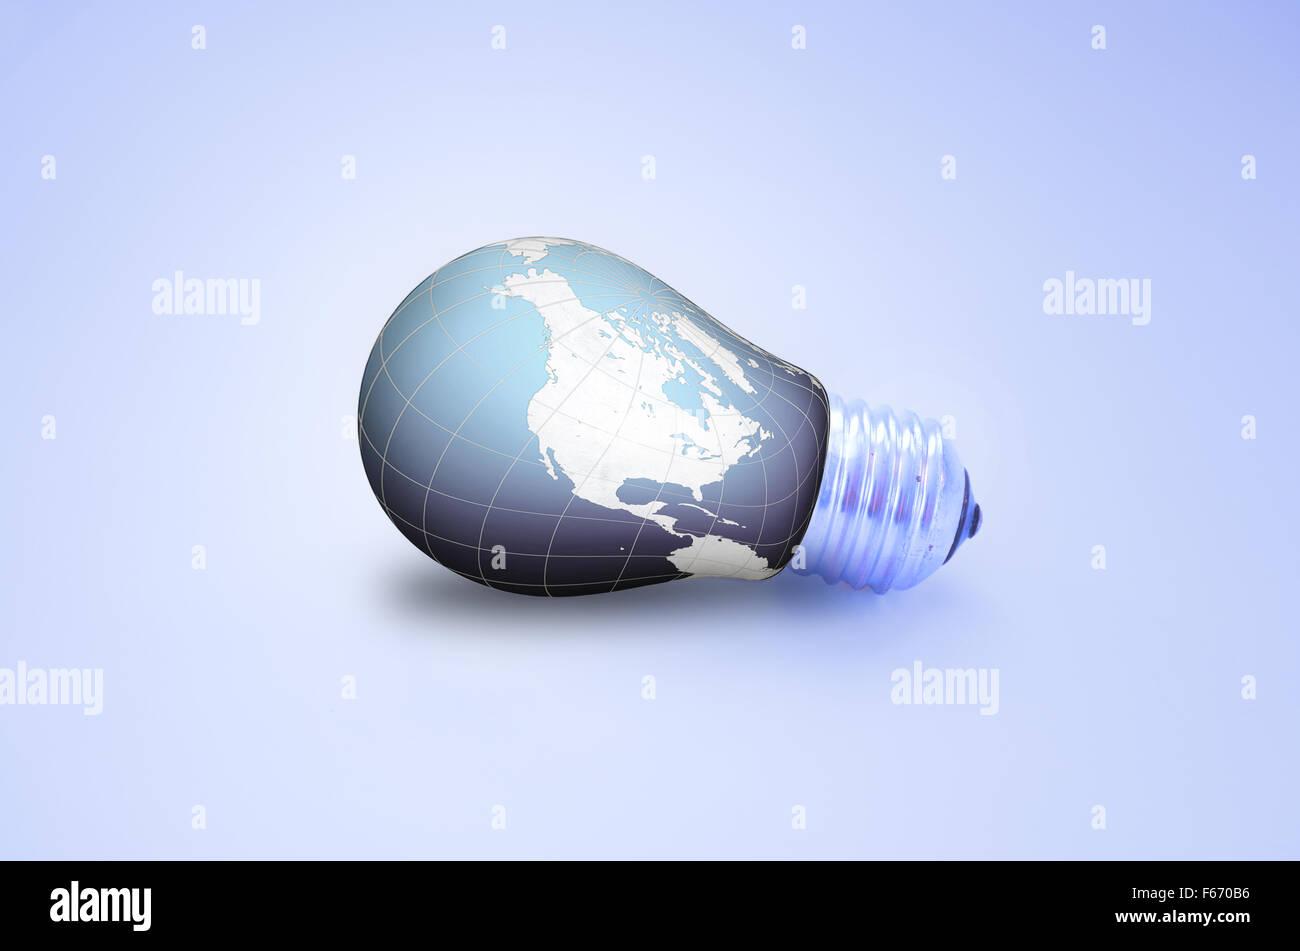 Bombilla mundo aislado sobre fondo blanco. Imagen De Stock